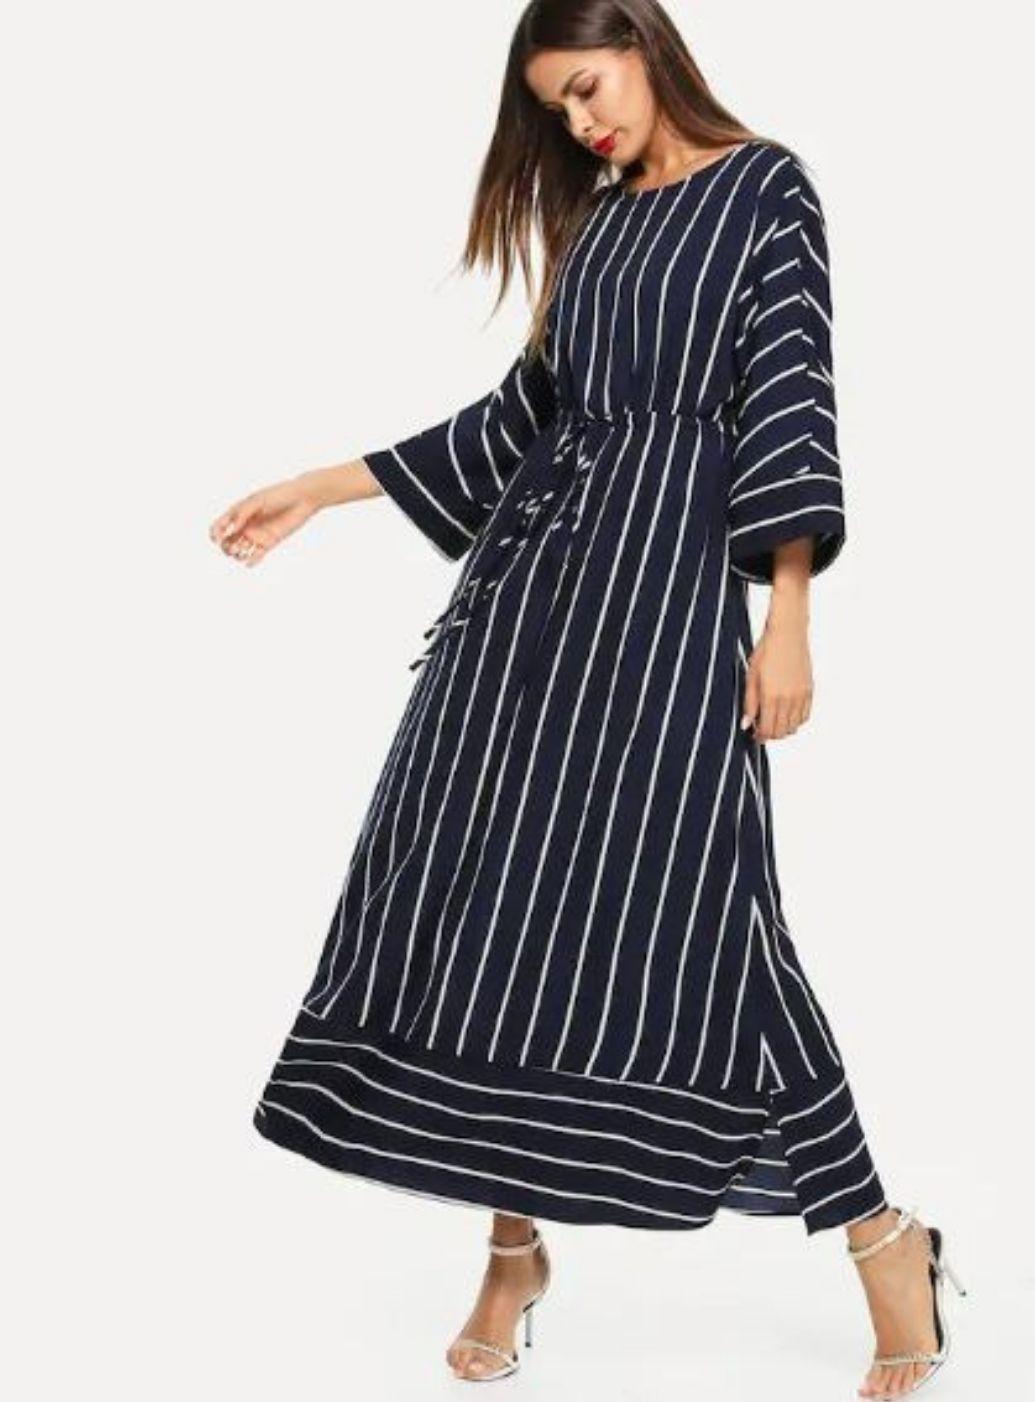 Shein Vertical Striped Drawstring Waist Maxi Dress Us 19 00 Striped Dress Floral Wrap Maxi Dress Floral Lace Maxi Dress [ 1402 x 1035 Pixel ]